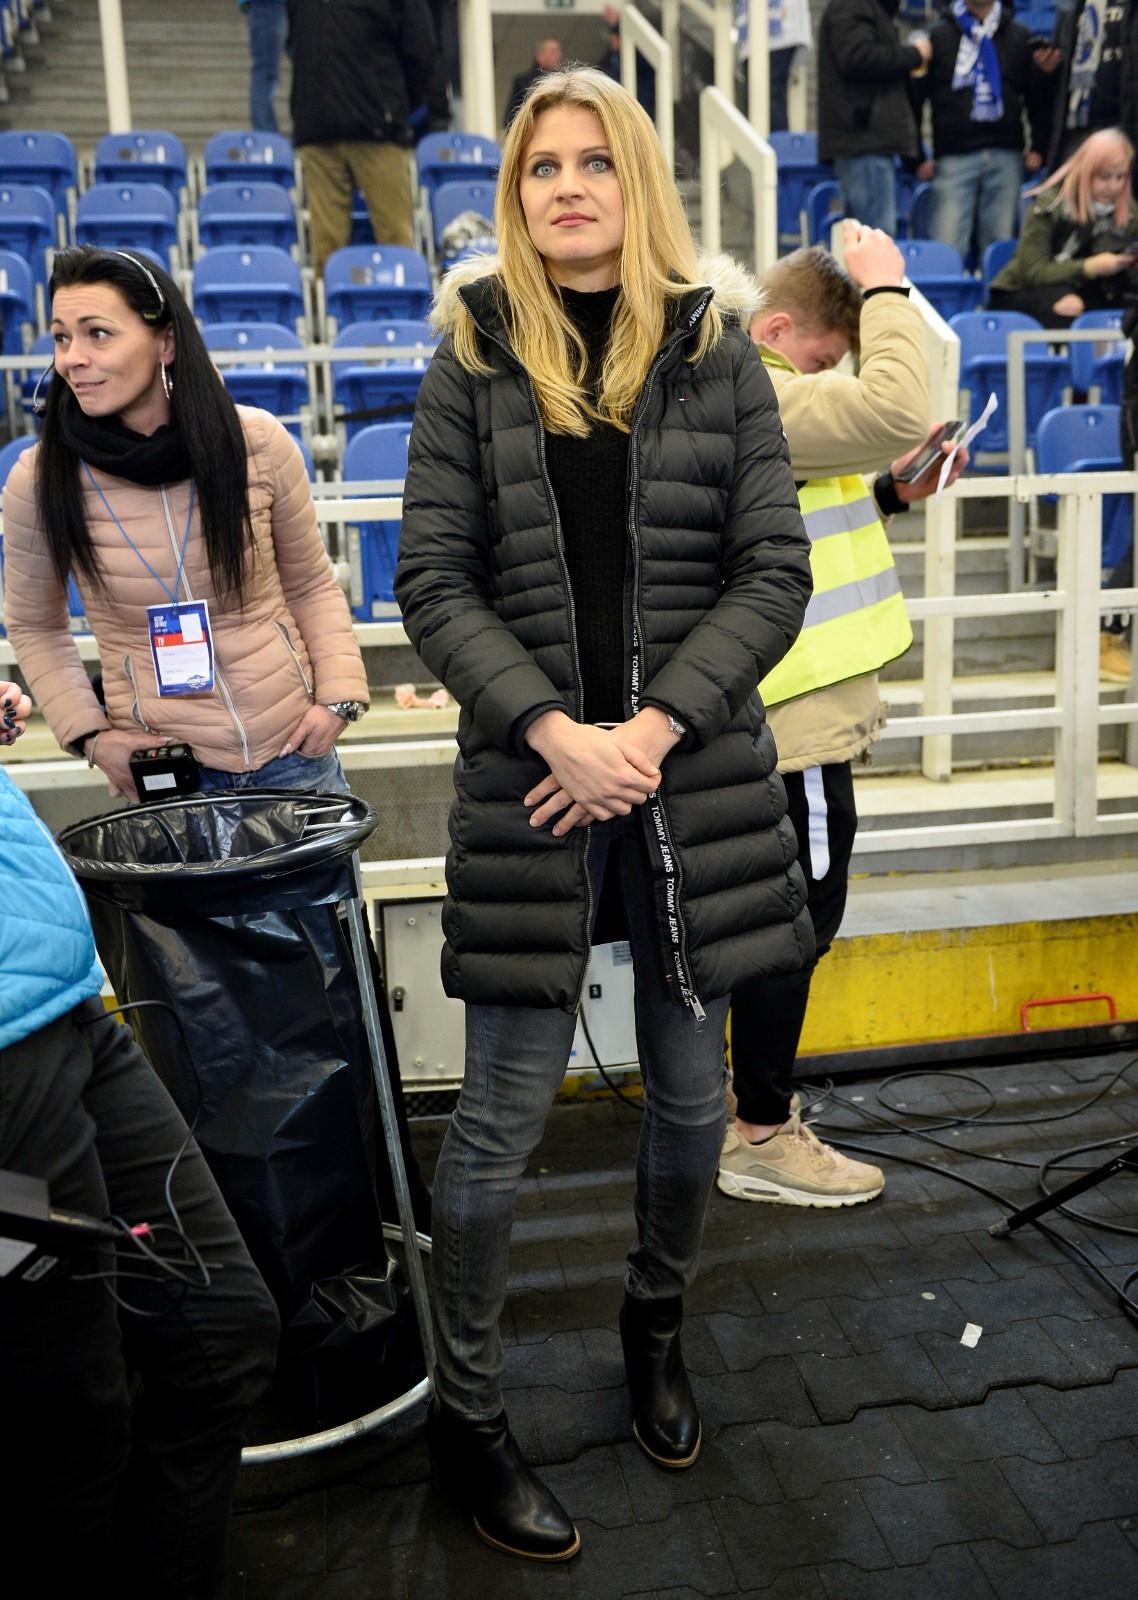 Tenistka Lucie Šafářová